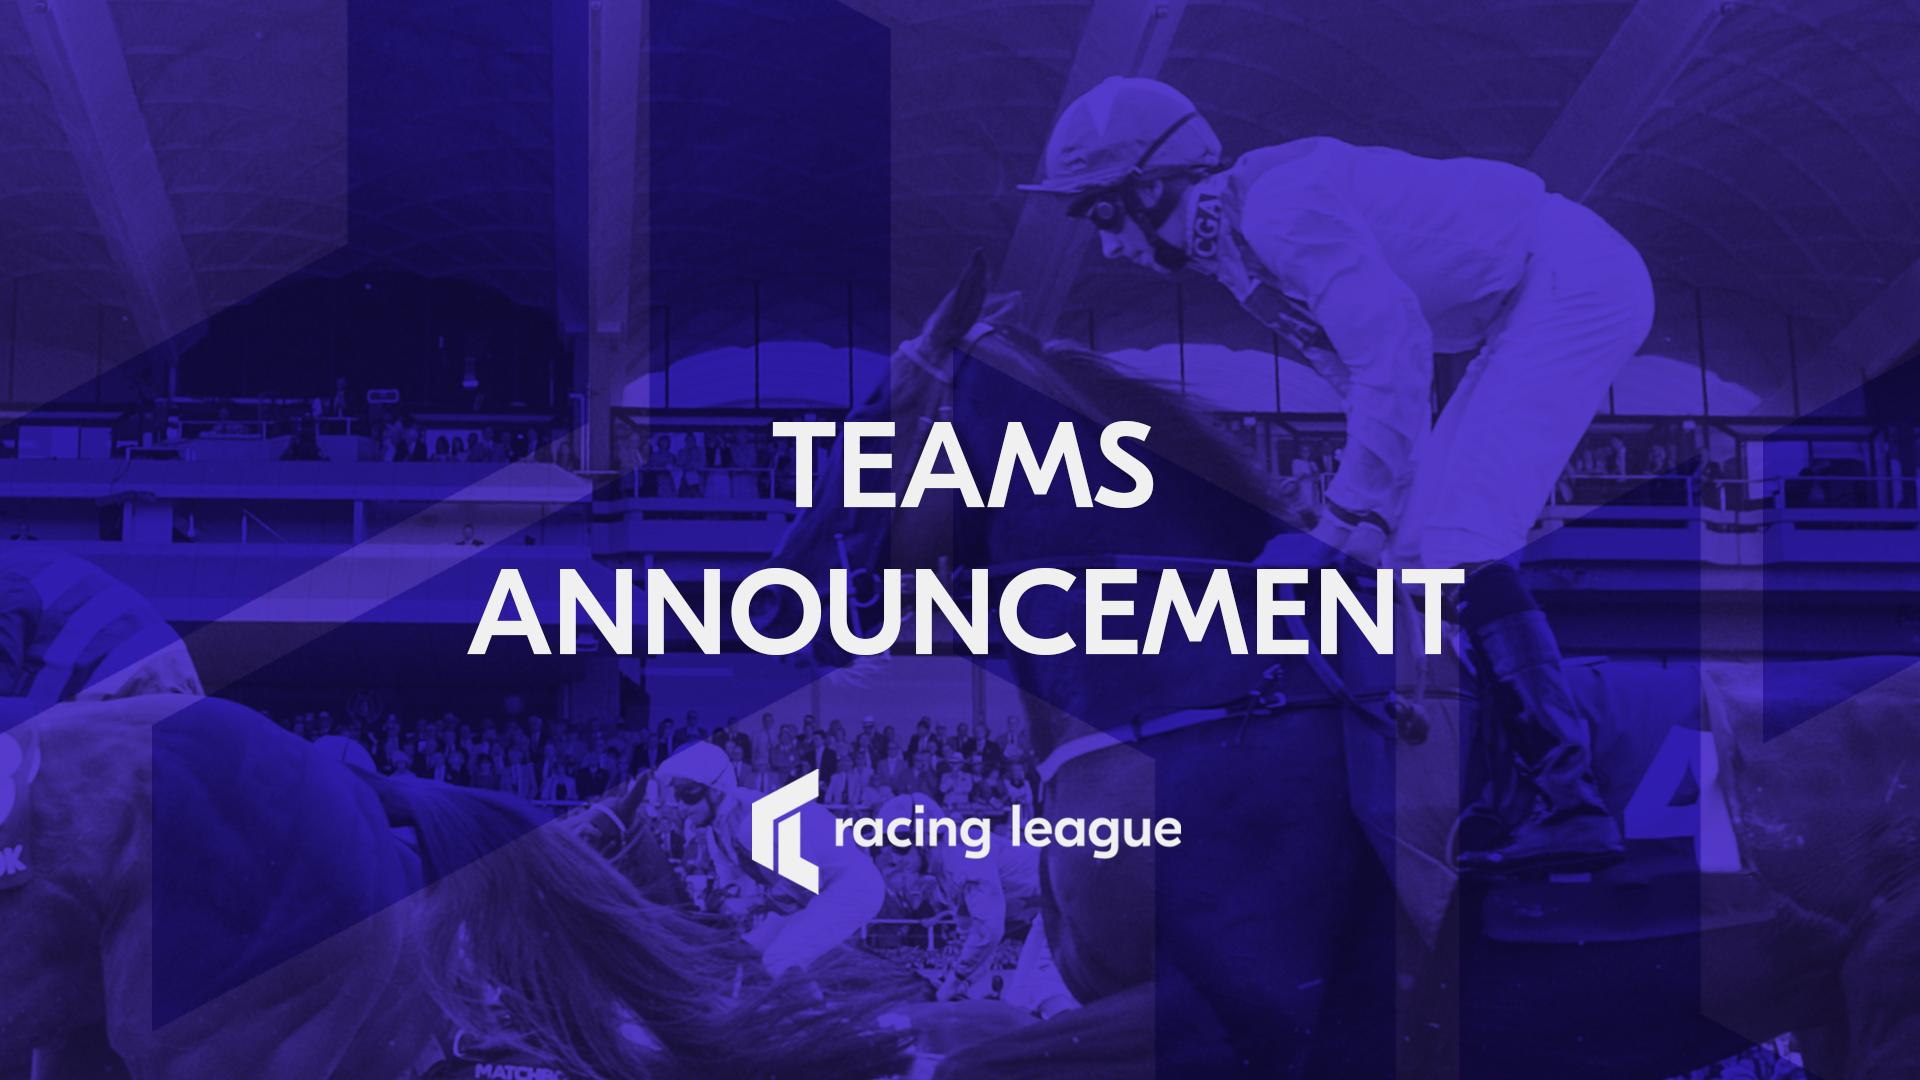 Racing League's remaining 6 teams announced